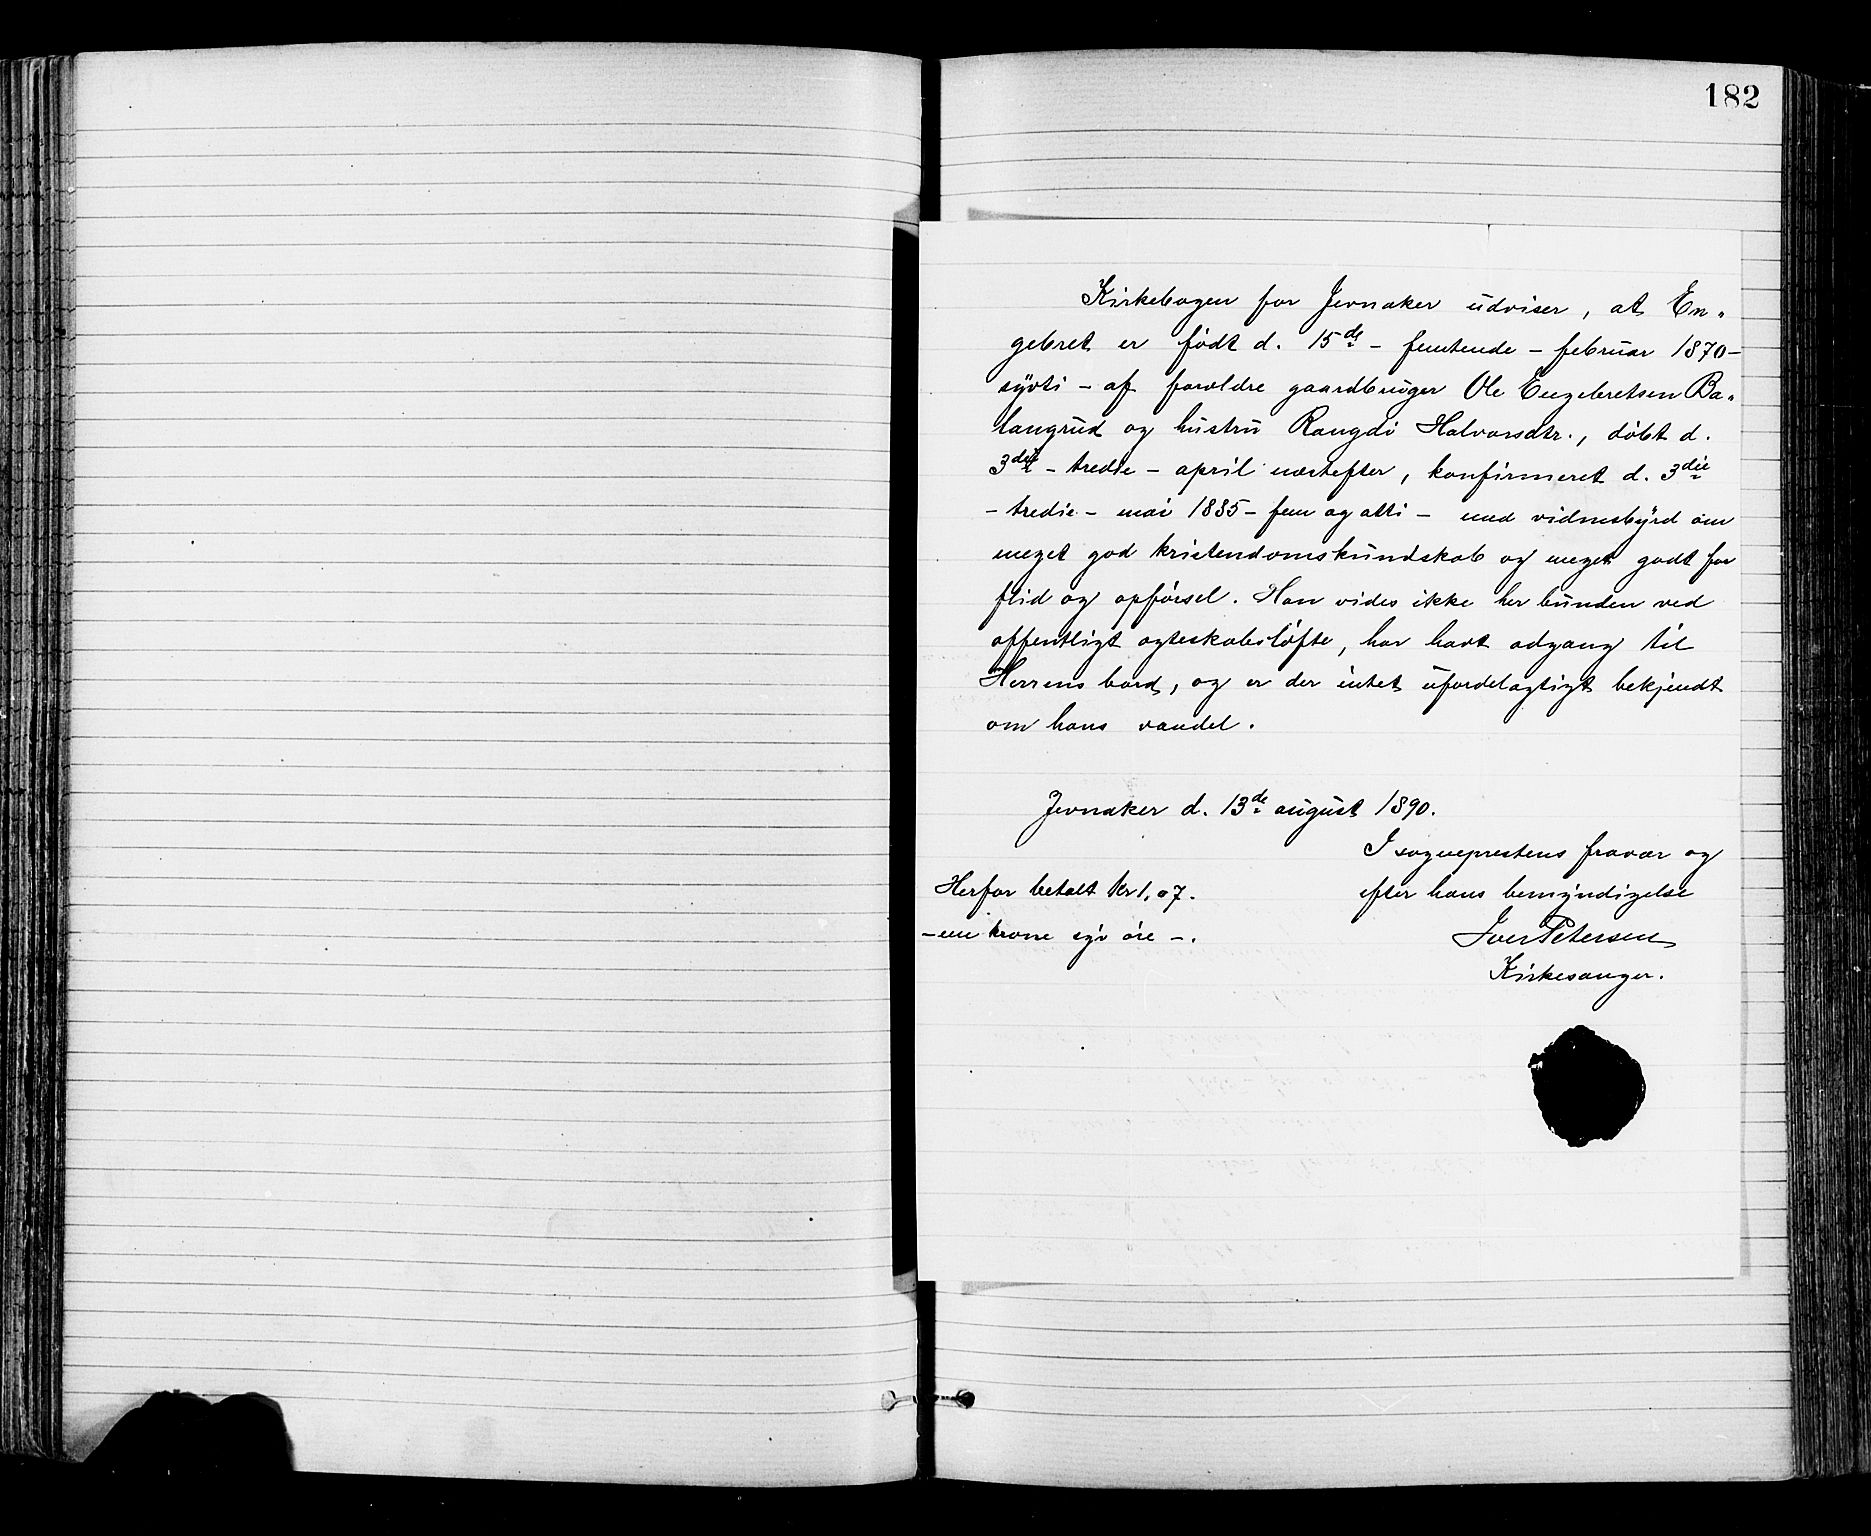 SAH, Jevnaker prestekontor, Ministerialbok nr. 8, 1877-1890, s. 182